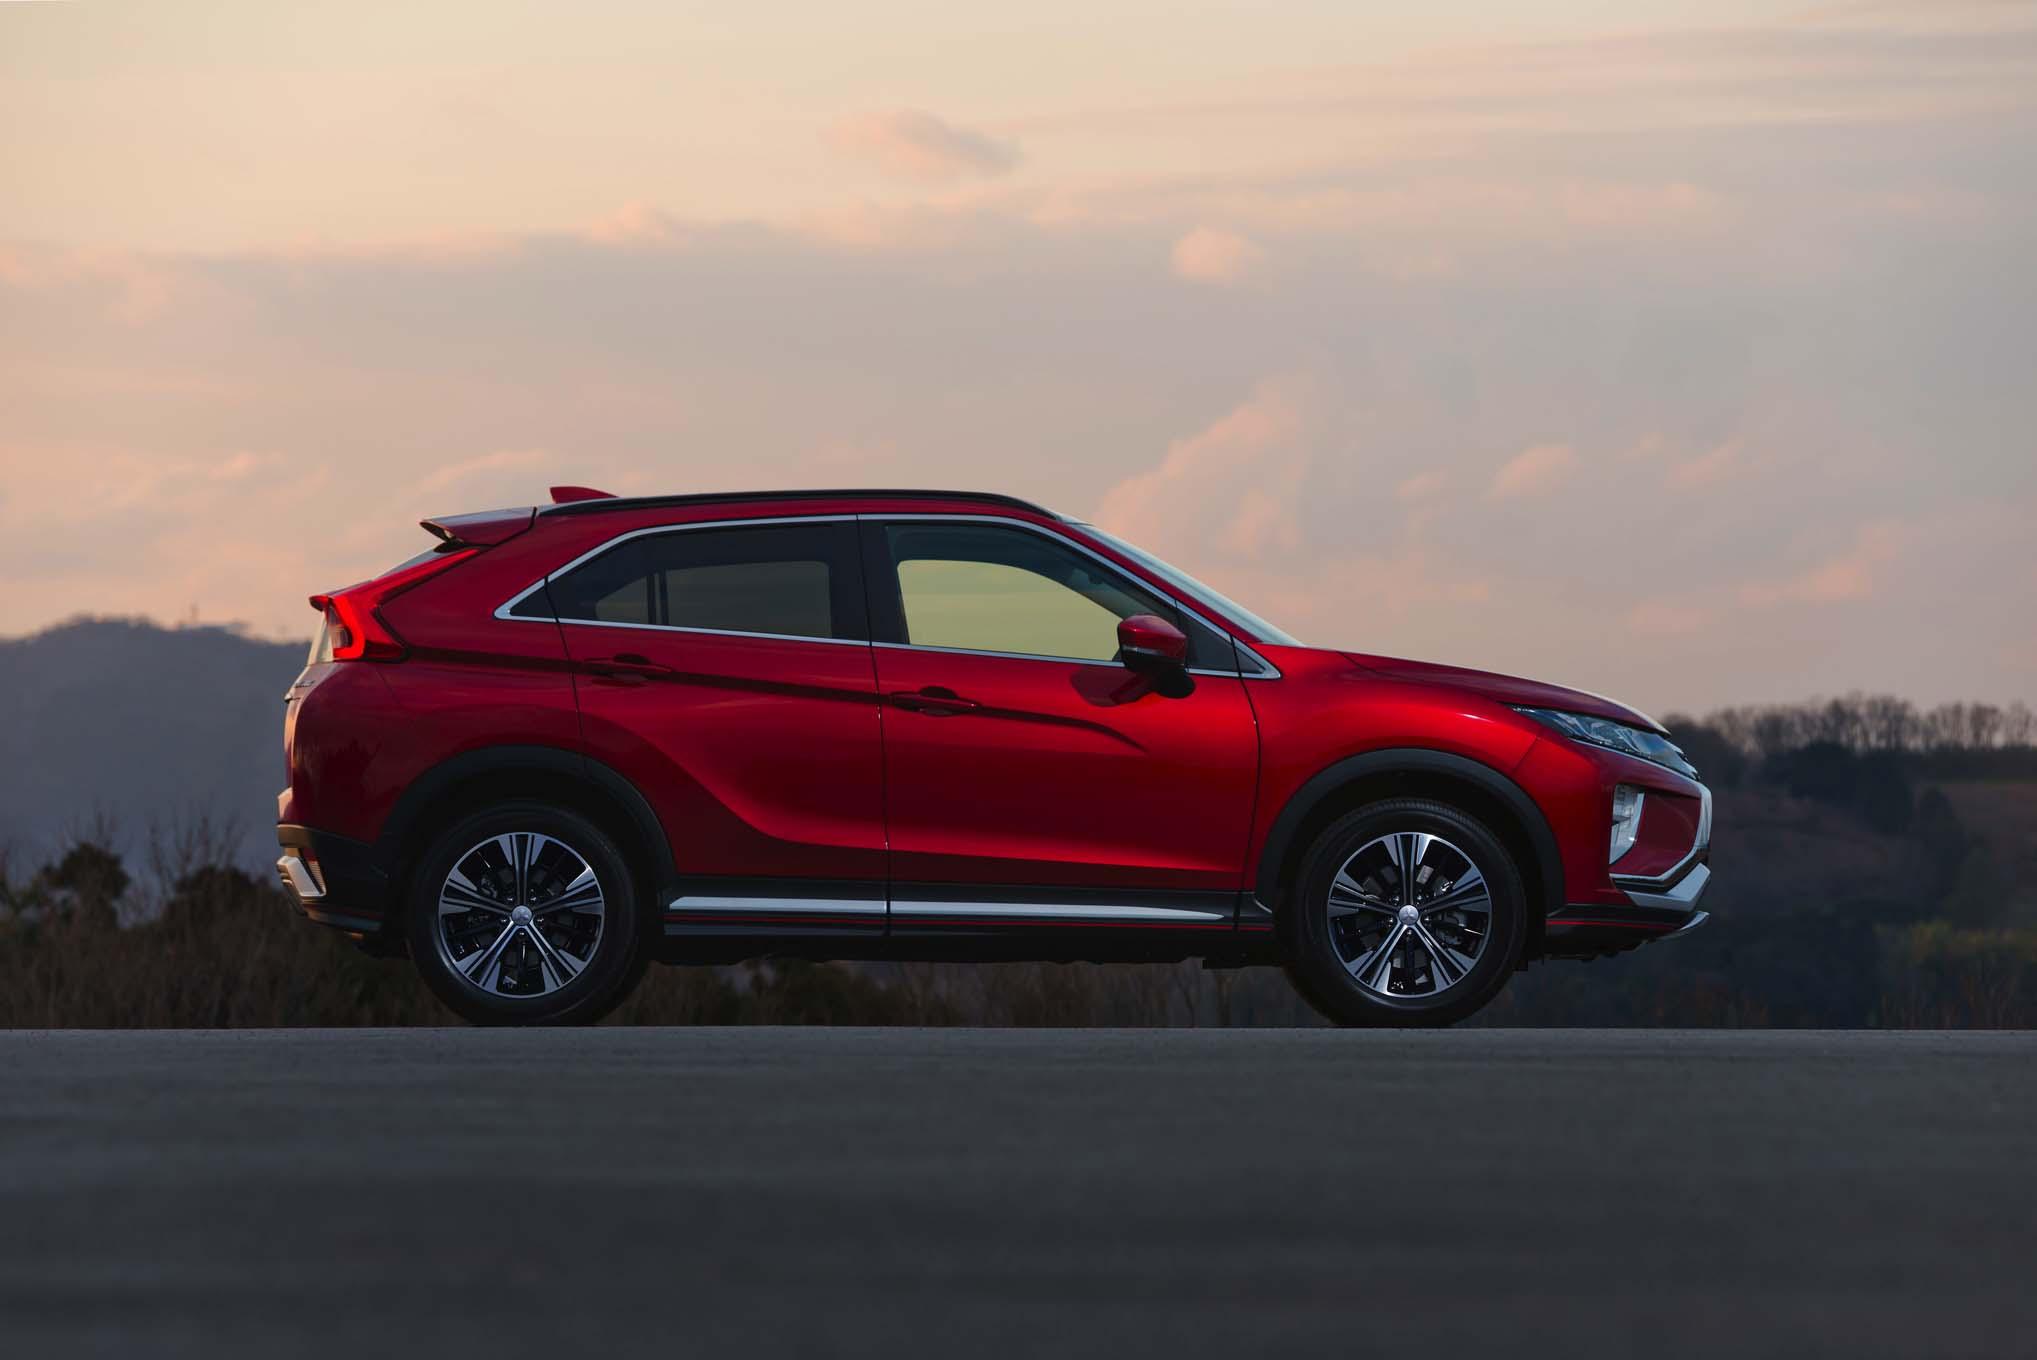 2018-Mitsubishi-Eclipse-Cross-side-profile-2